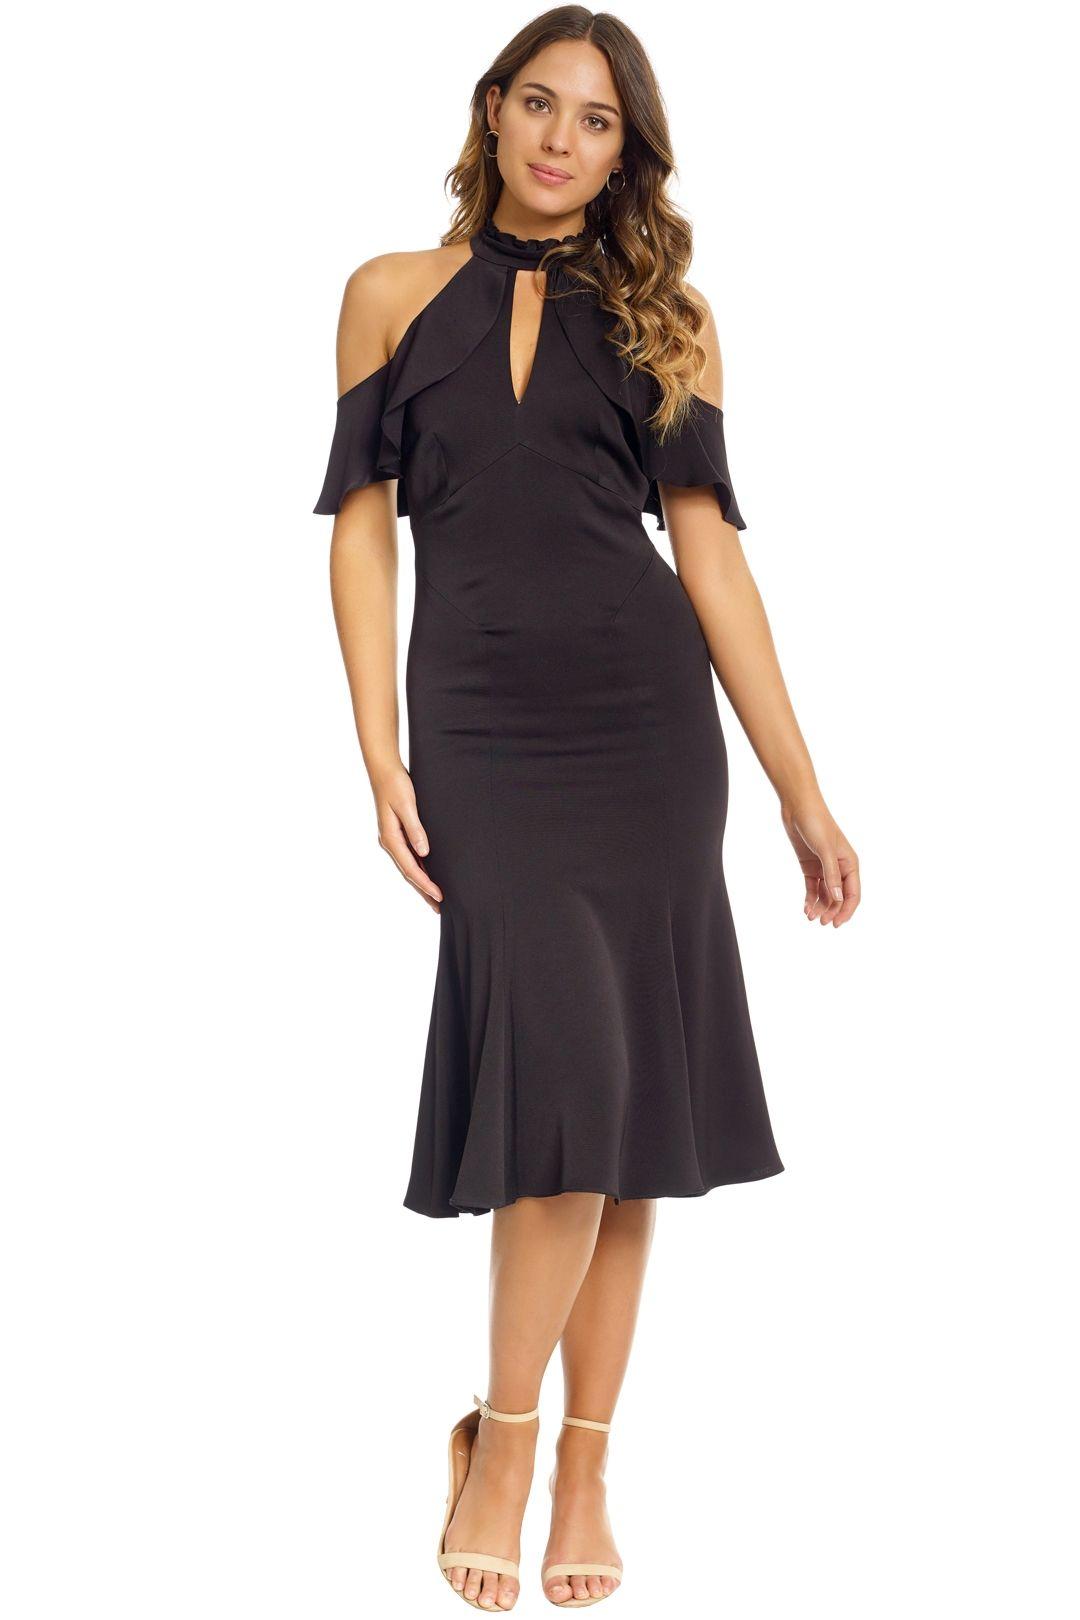 Shoshanna - Sausalito Midi Dress - Front - Black